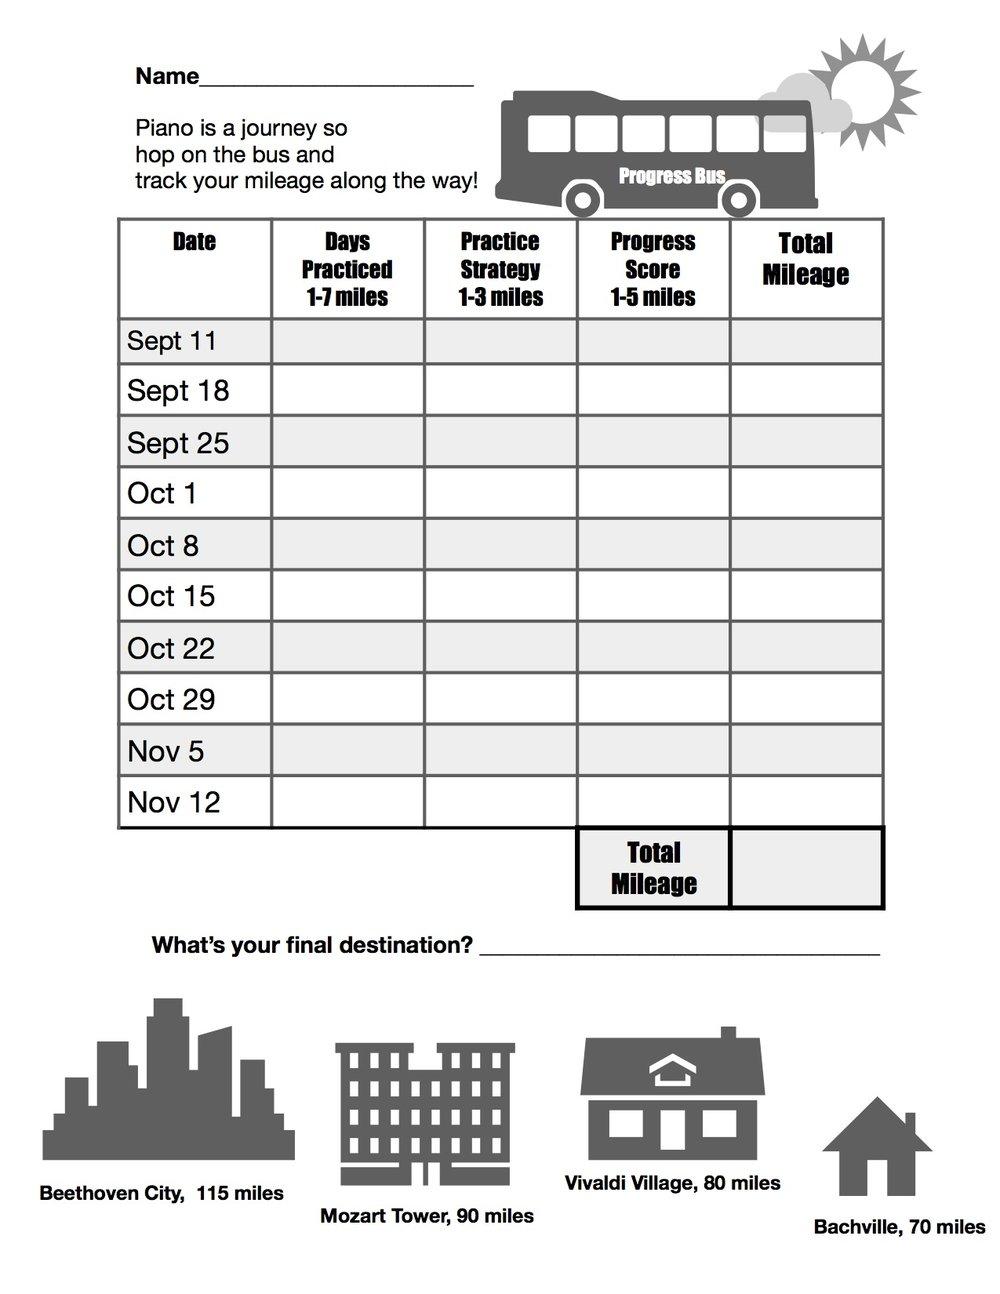 PP-18-Incentive-plan.jpg